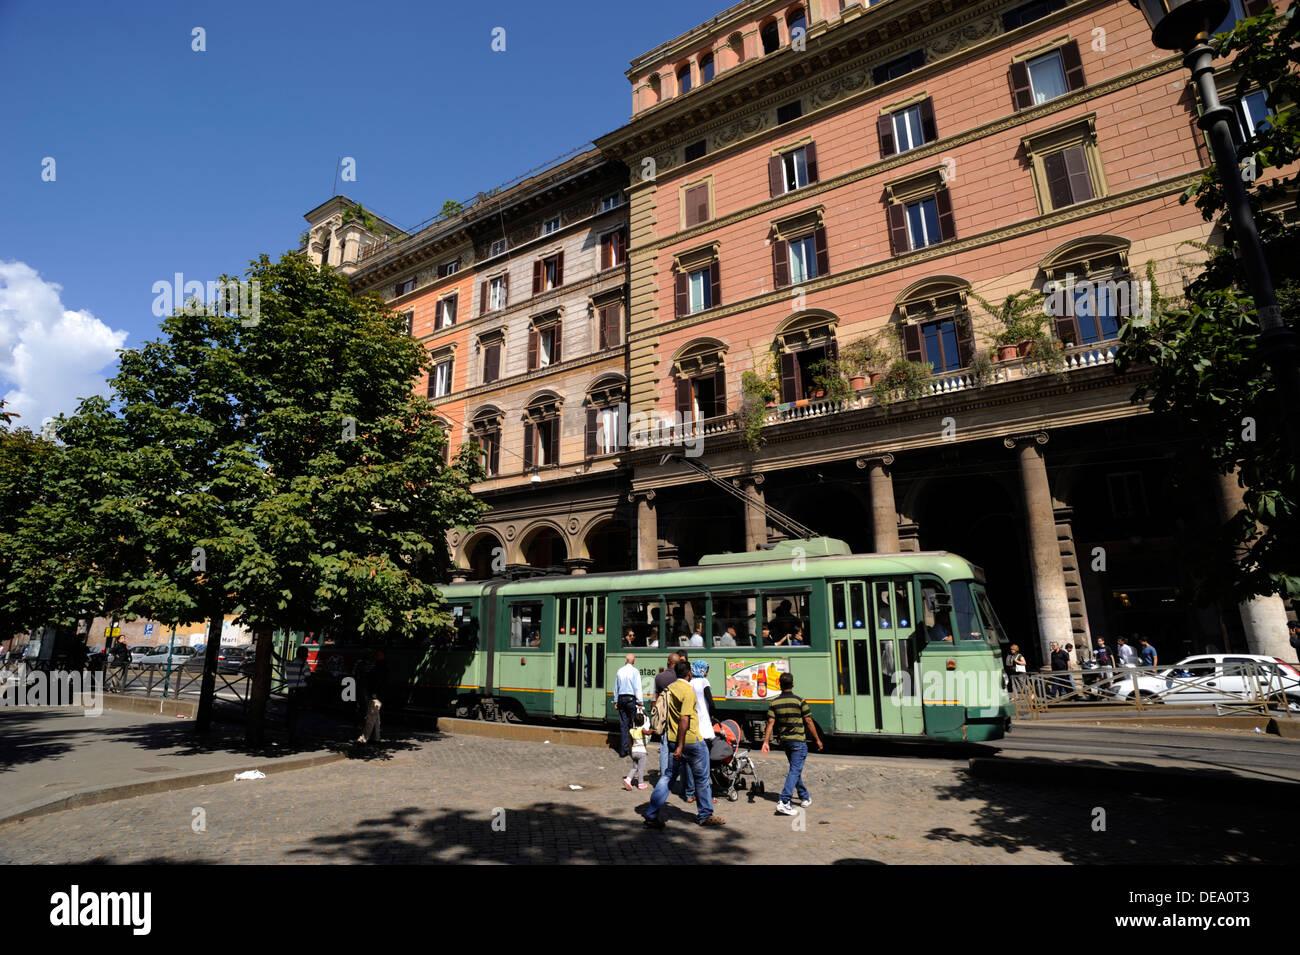 italy, rome, piazza vittorio emanuele II - Stock Image